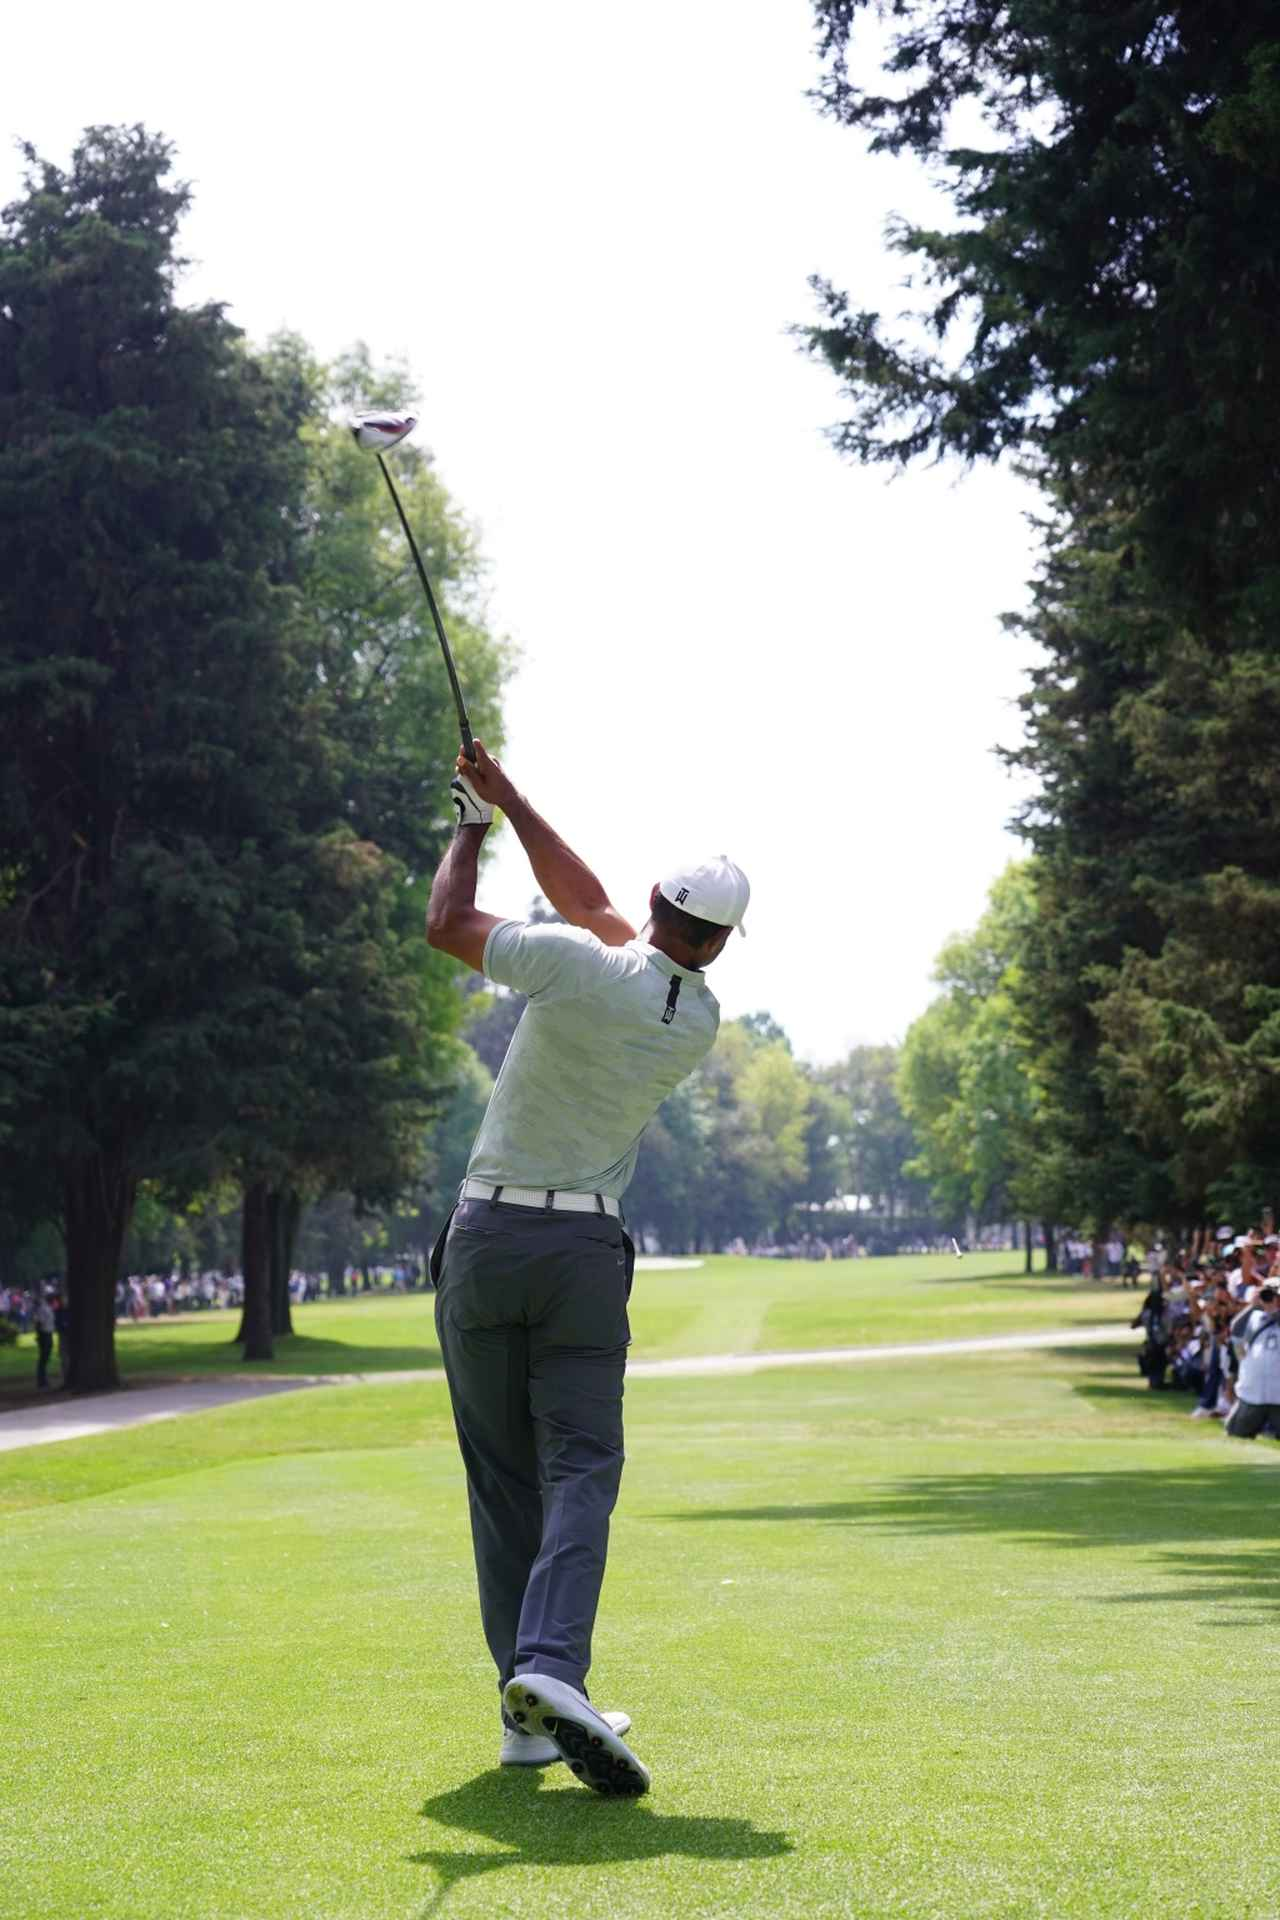 Images : 12番目の画像 - タイガー・ウッズのドライバー連続写真 - みんなのゴルフダイジェスト